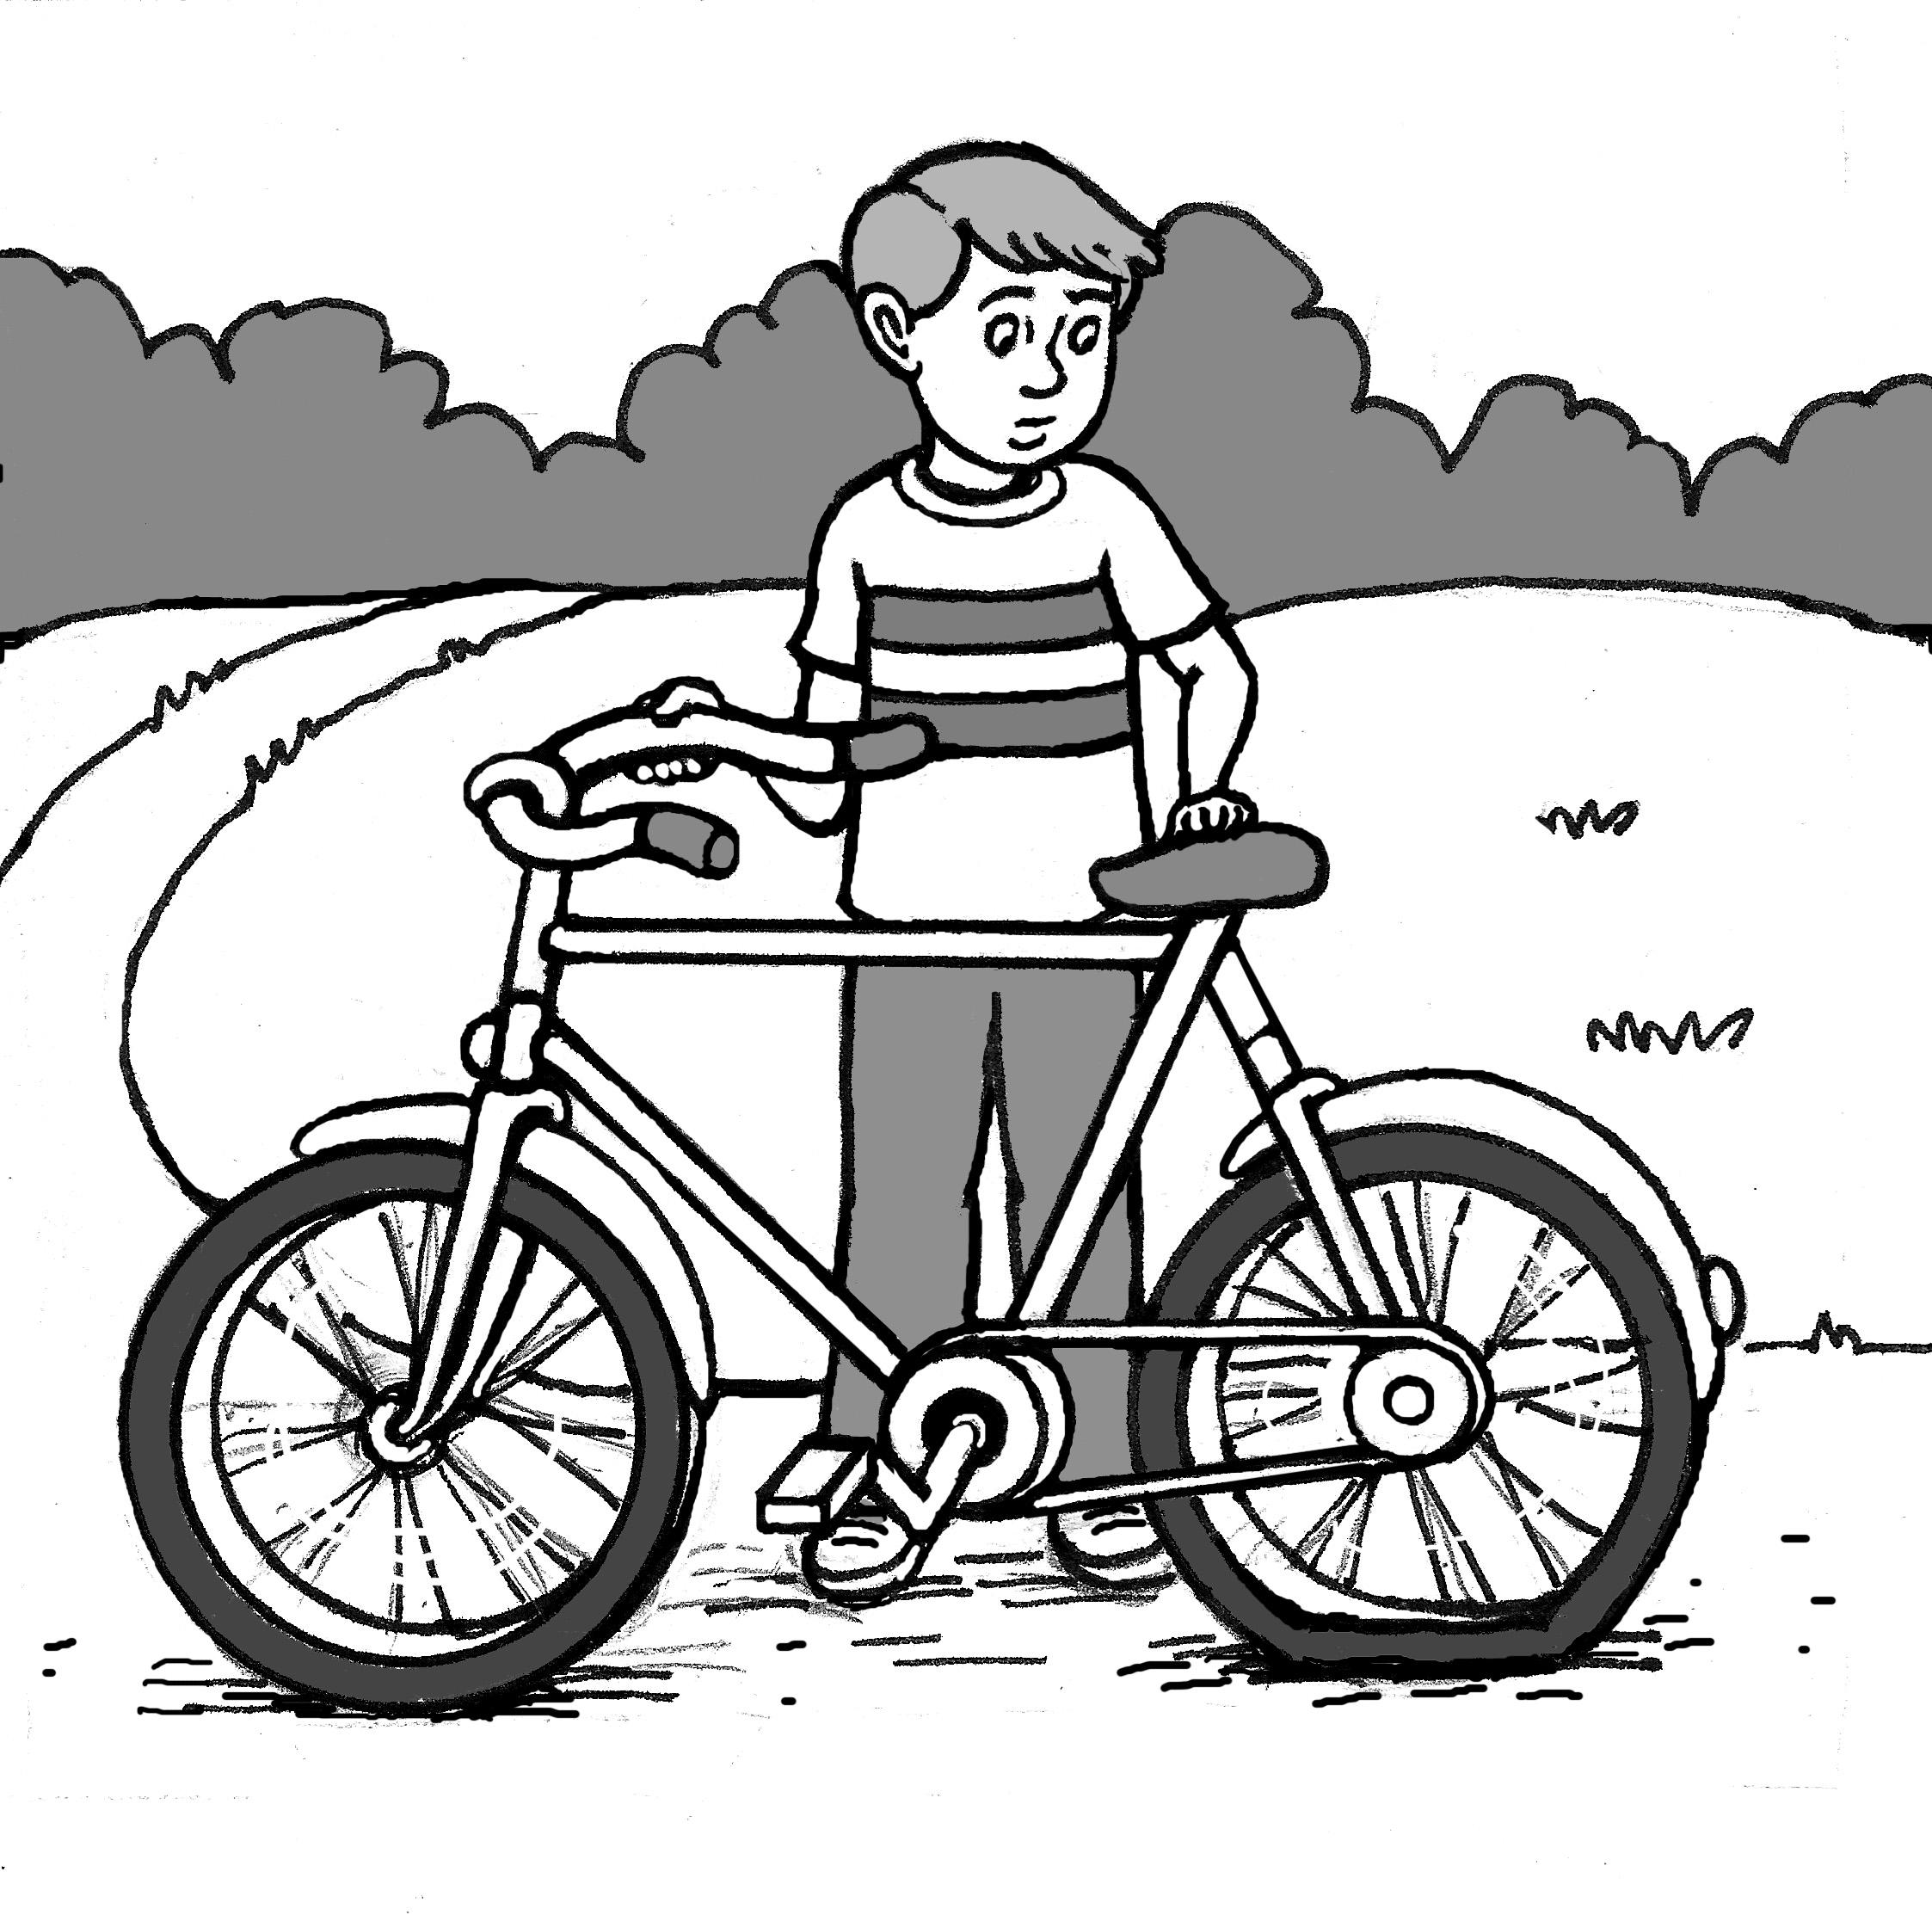 Bike clipart flat tire Reverse jpg Flat Drawing original_224802_wo5KIOYQfaO_5JaYGQNv4Ymi_